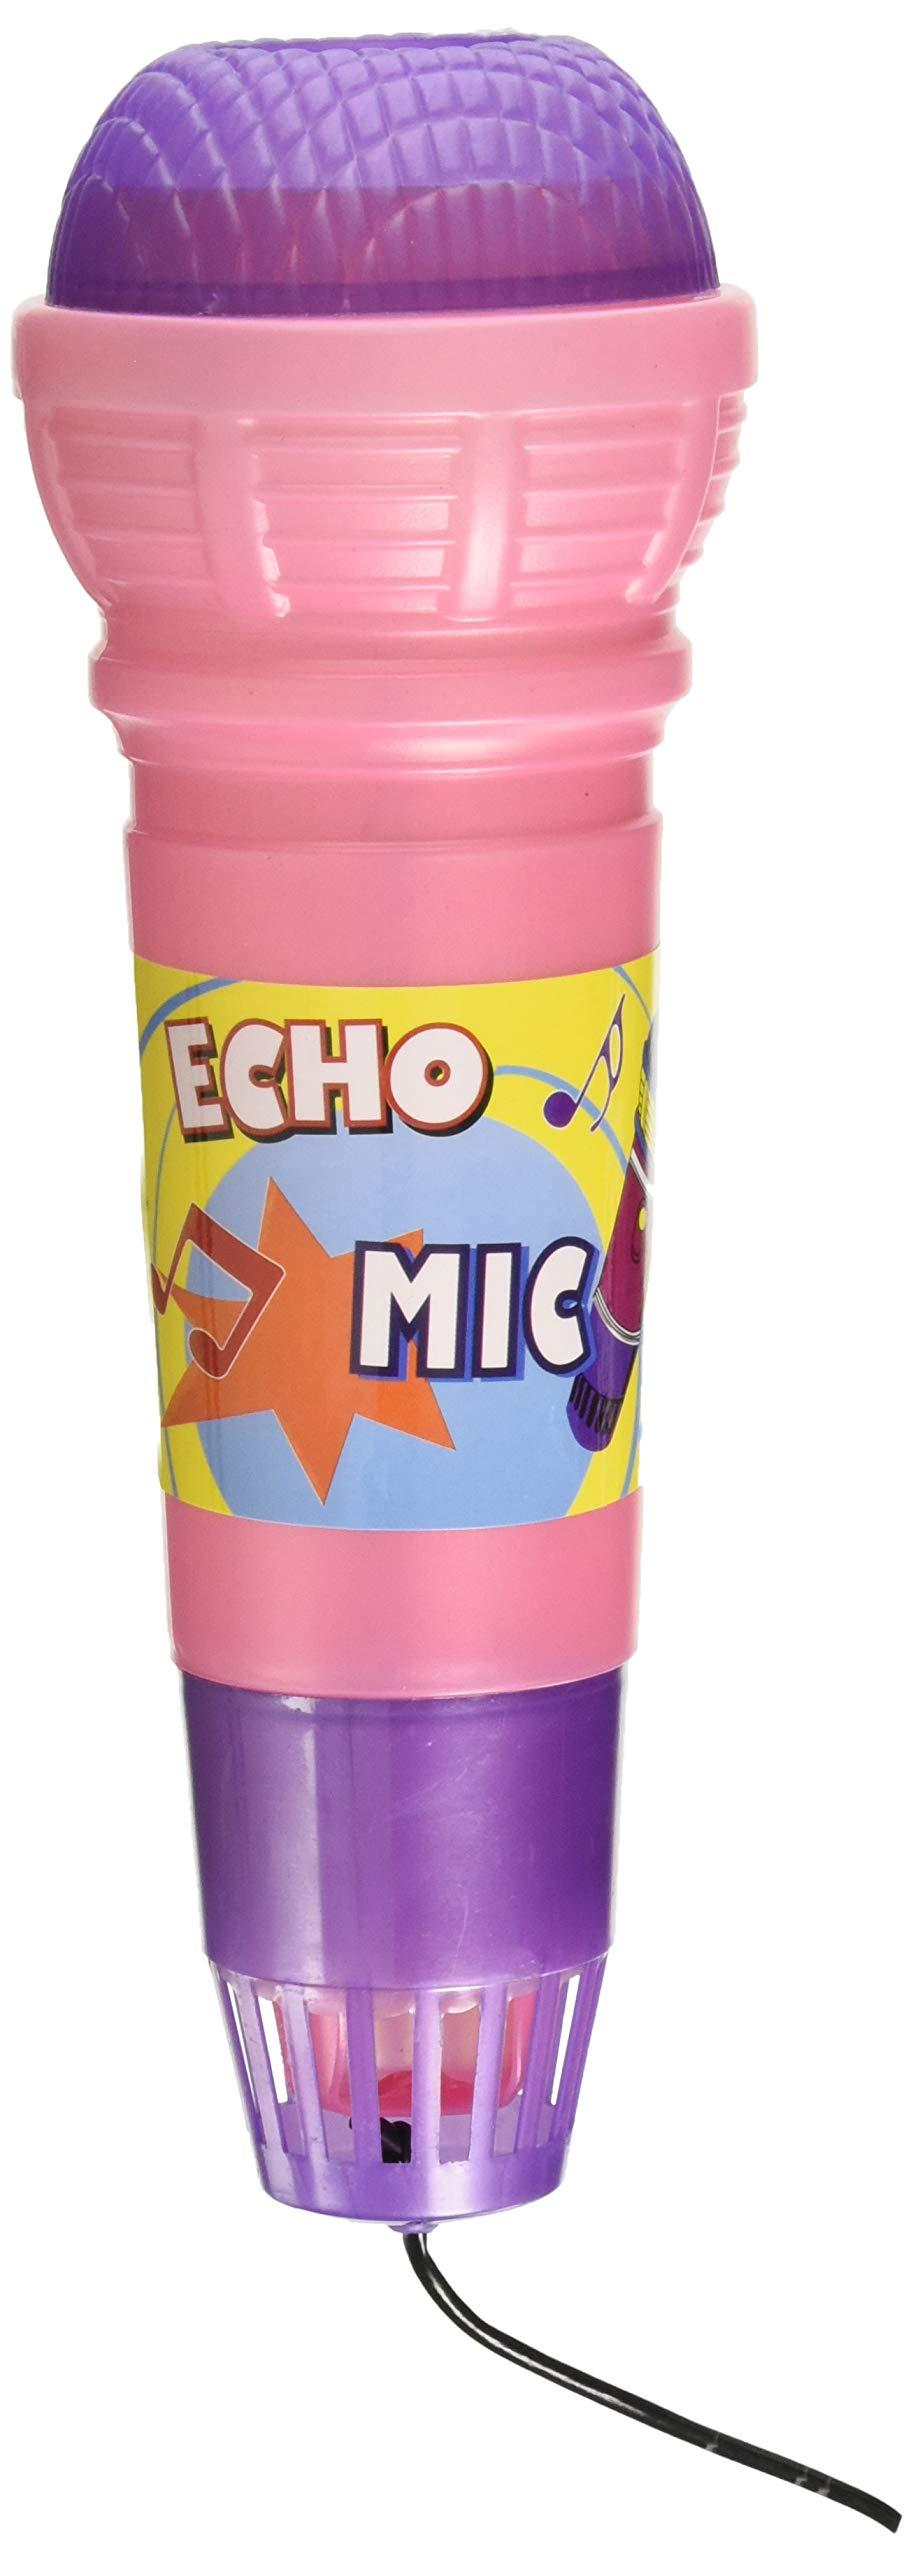 Echo Microphones (12/PKG)- Assorted Colors